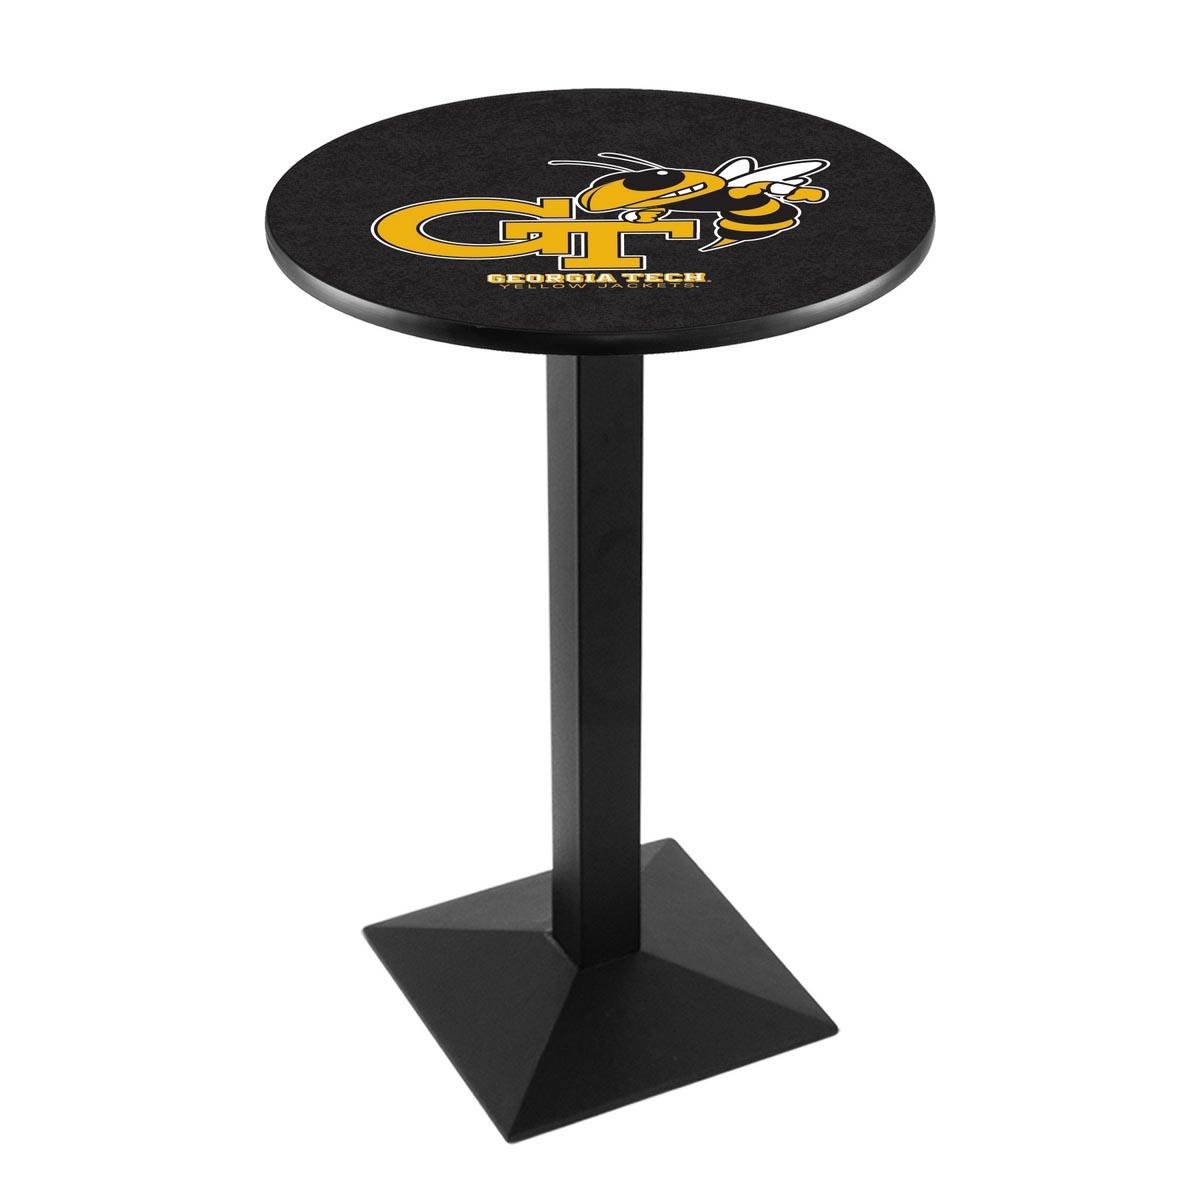 Reliable Georgia Tech Logo Pub Bar Table Square Stand Product Photo